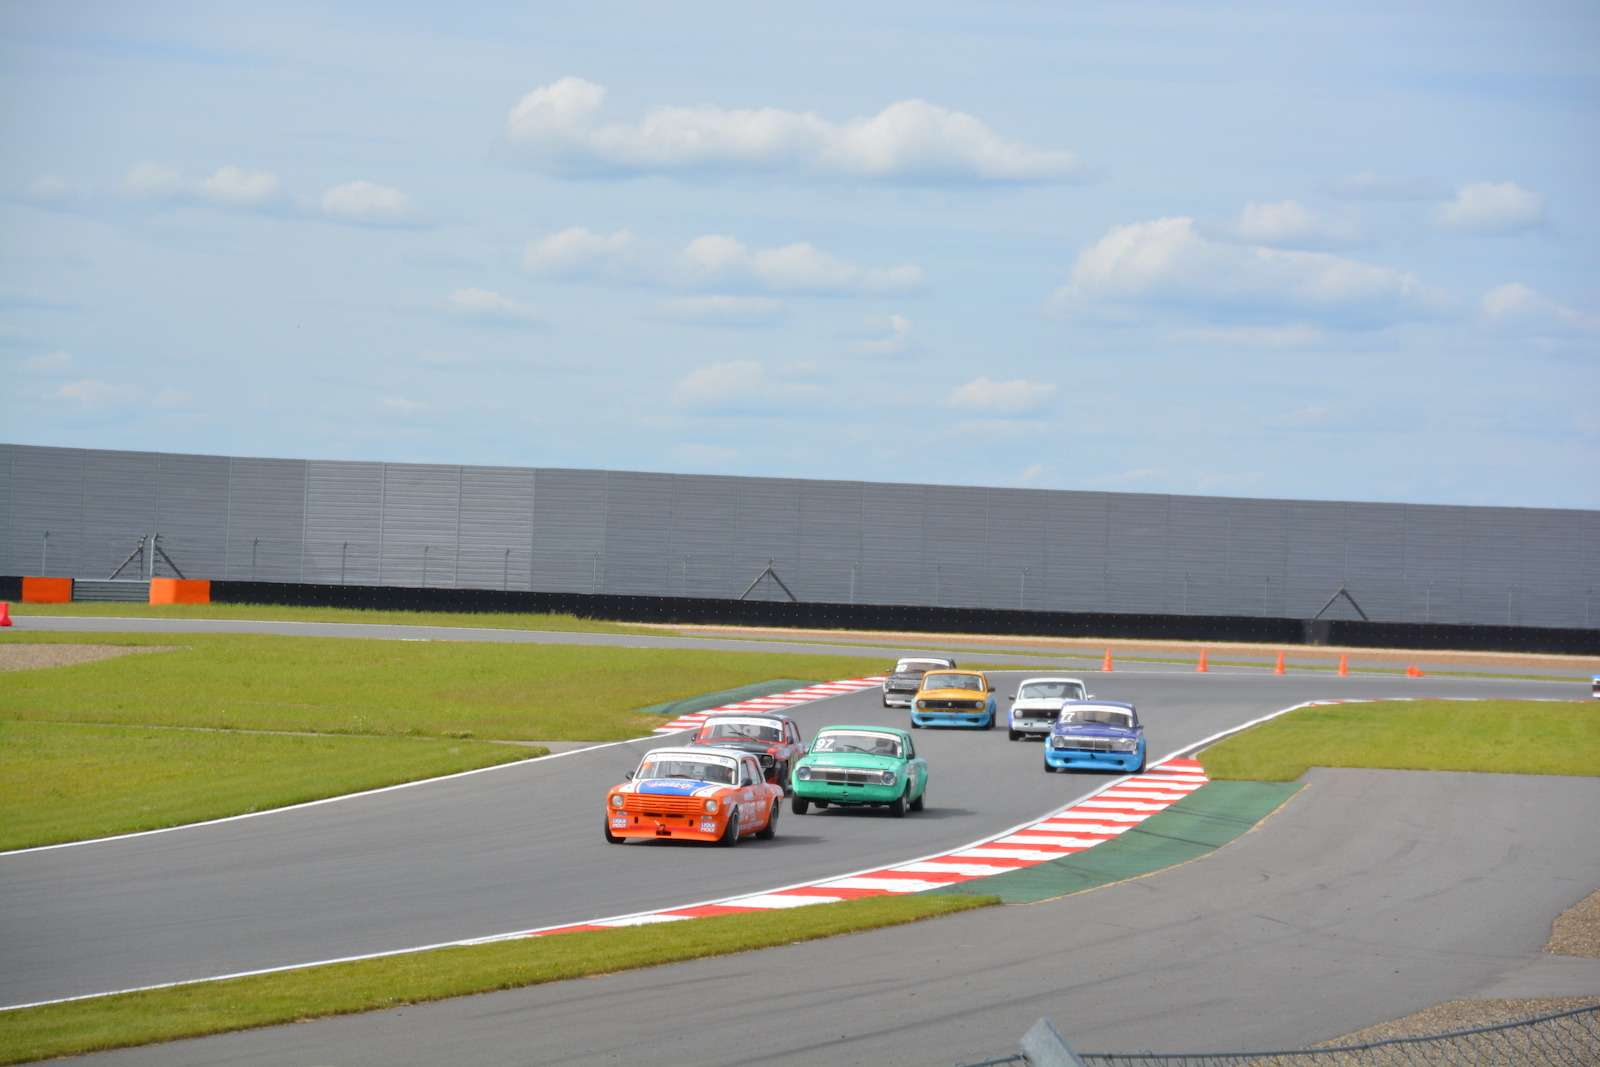 НаMoscow Raceway прошли гонки ретромобилей— фото 380483